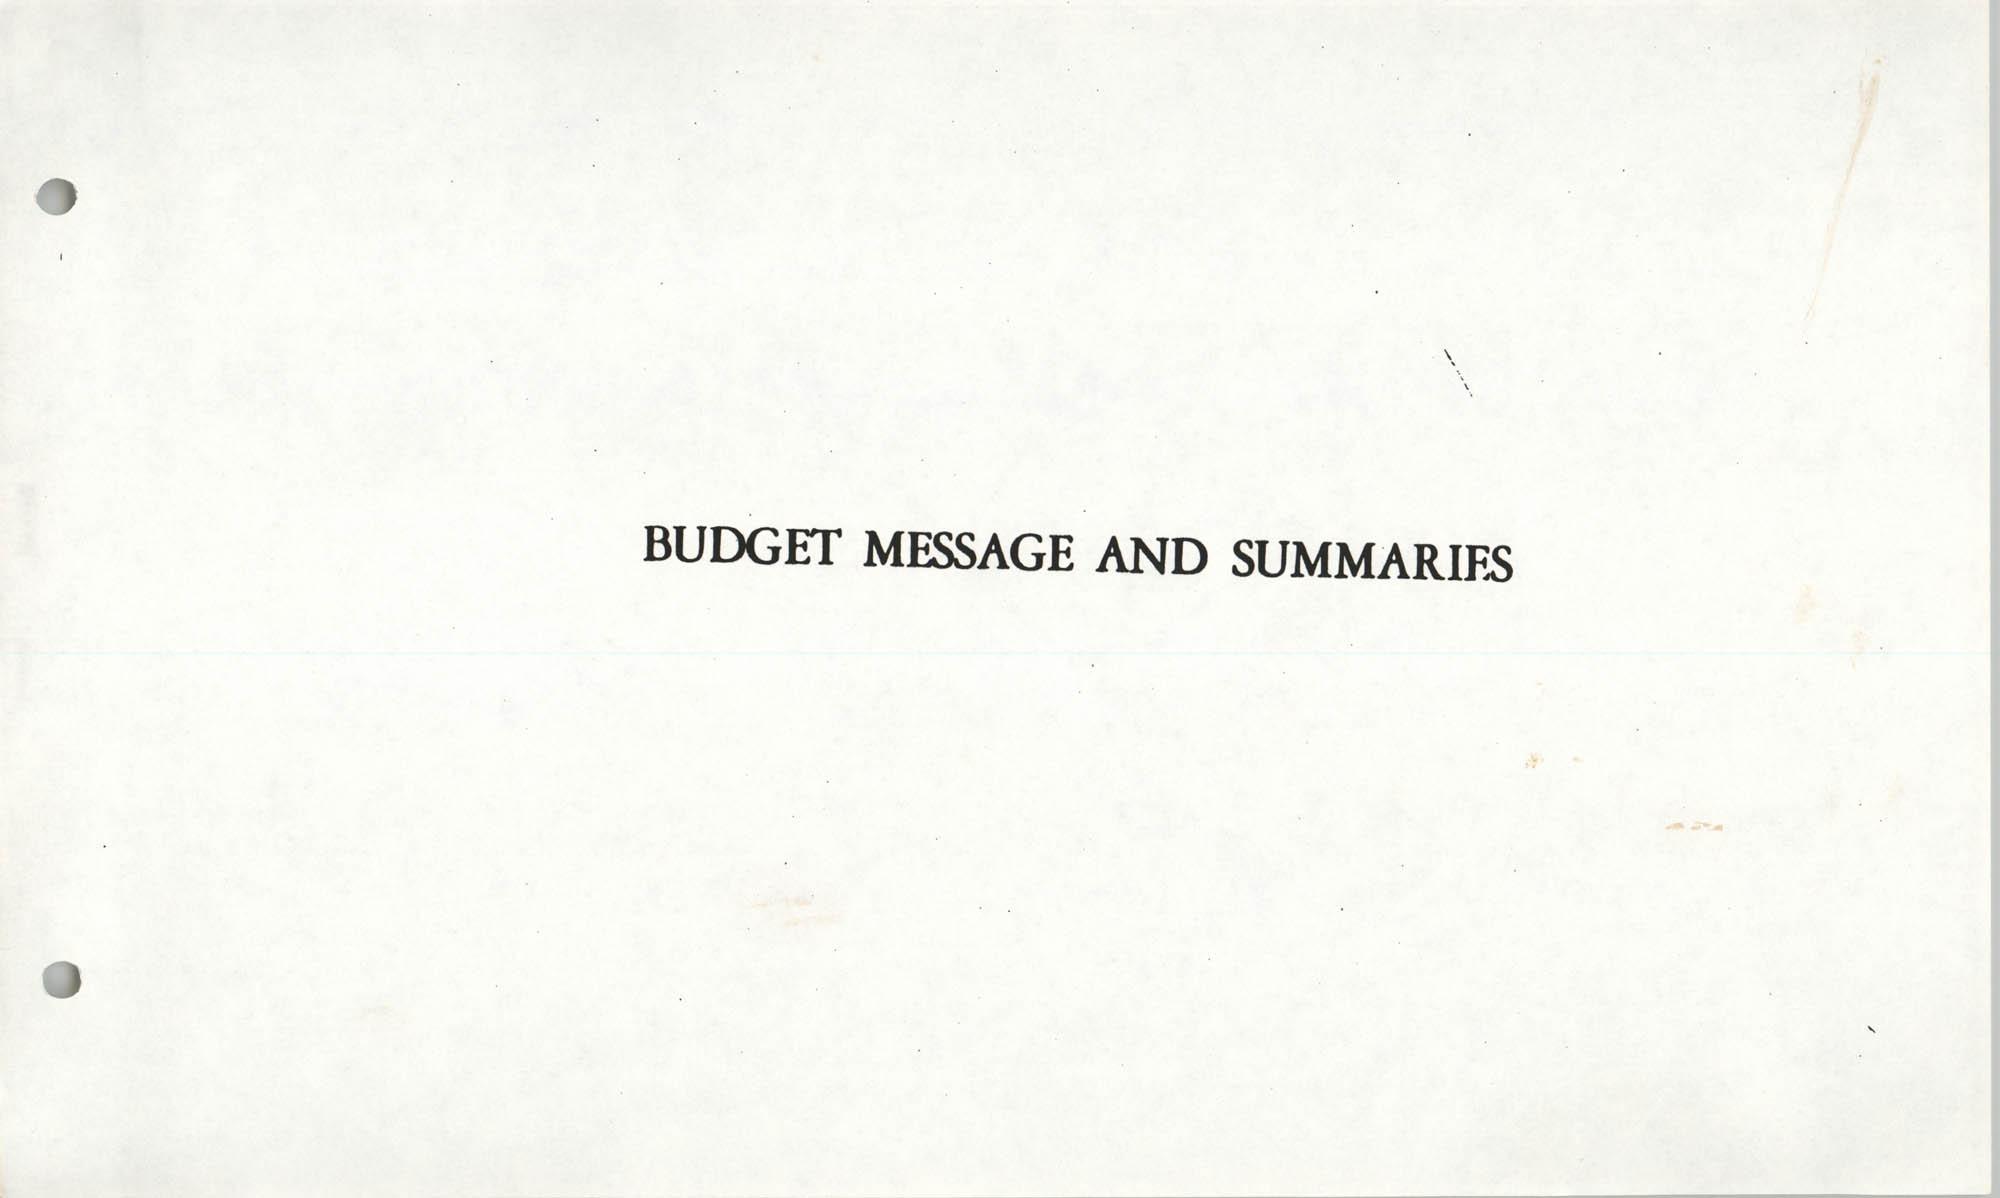 The City Council of Charleston, South Carolina, 1993 Budget, Budget Message and Summaries